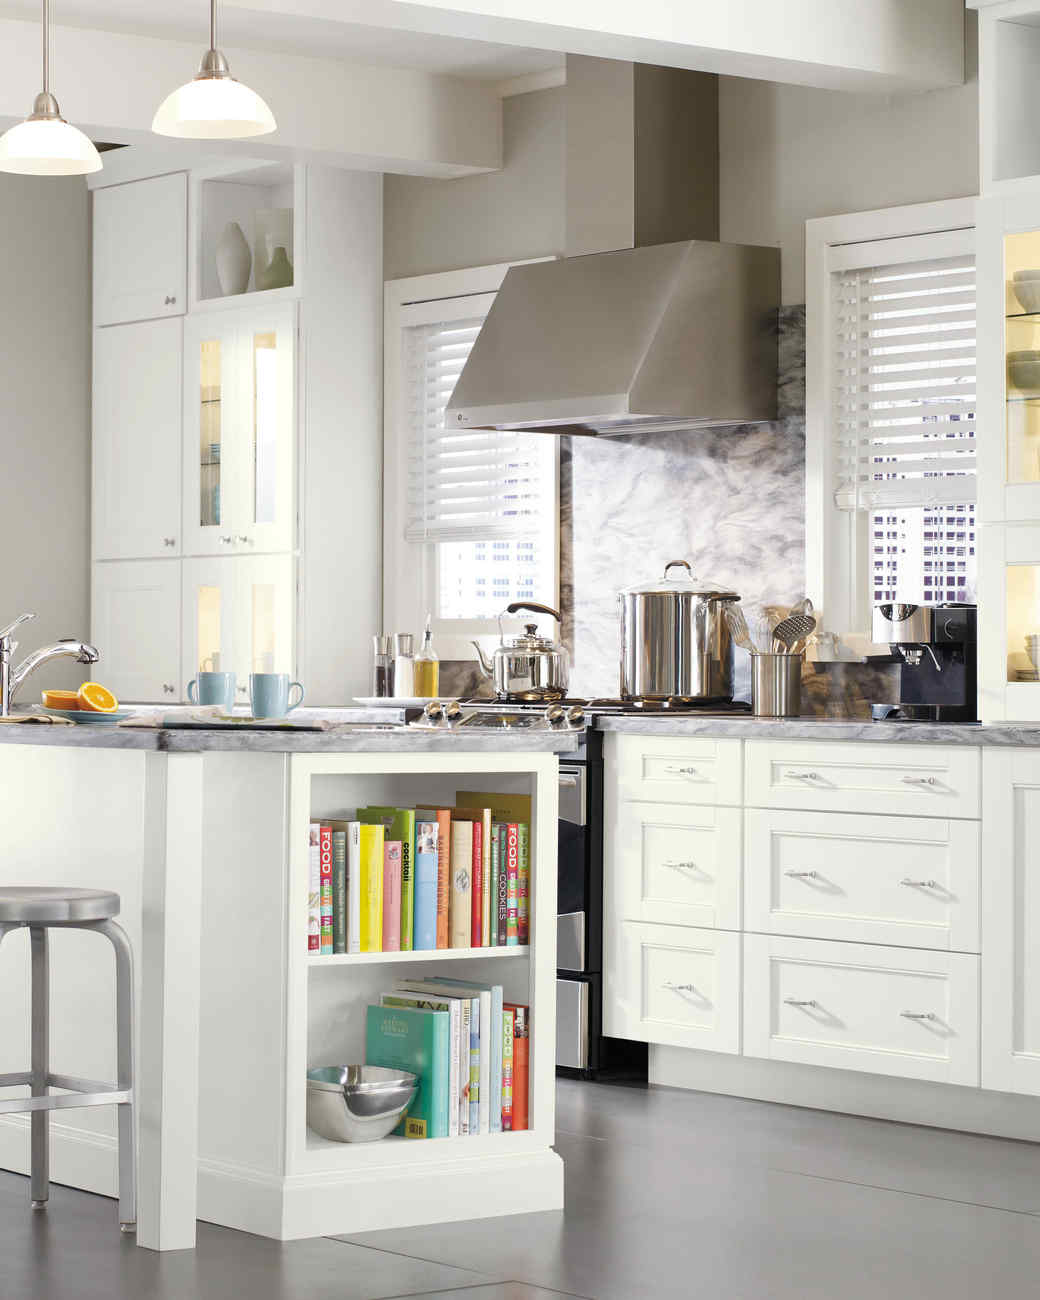 Etonnant Home Depot Kitchen Dunemere Stools White